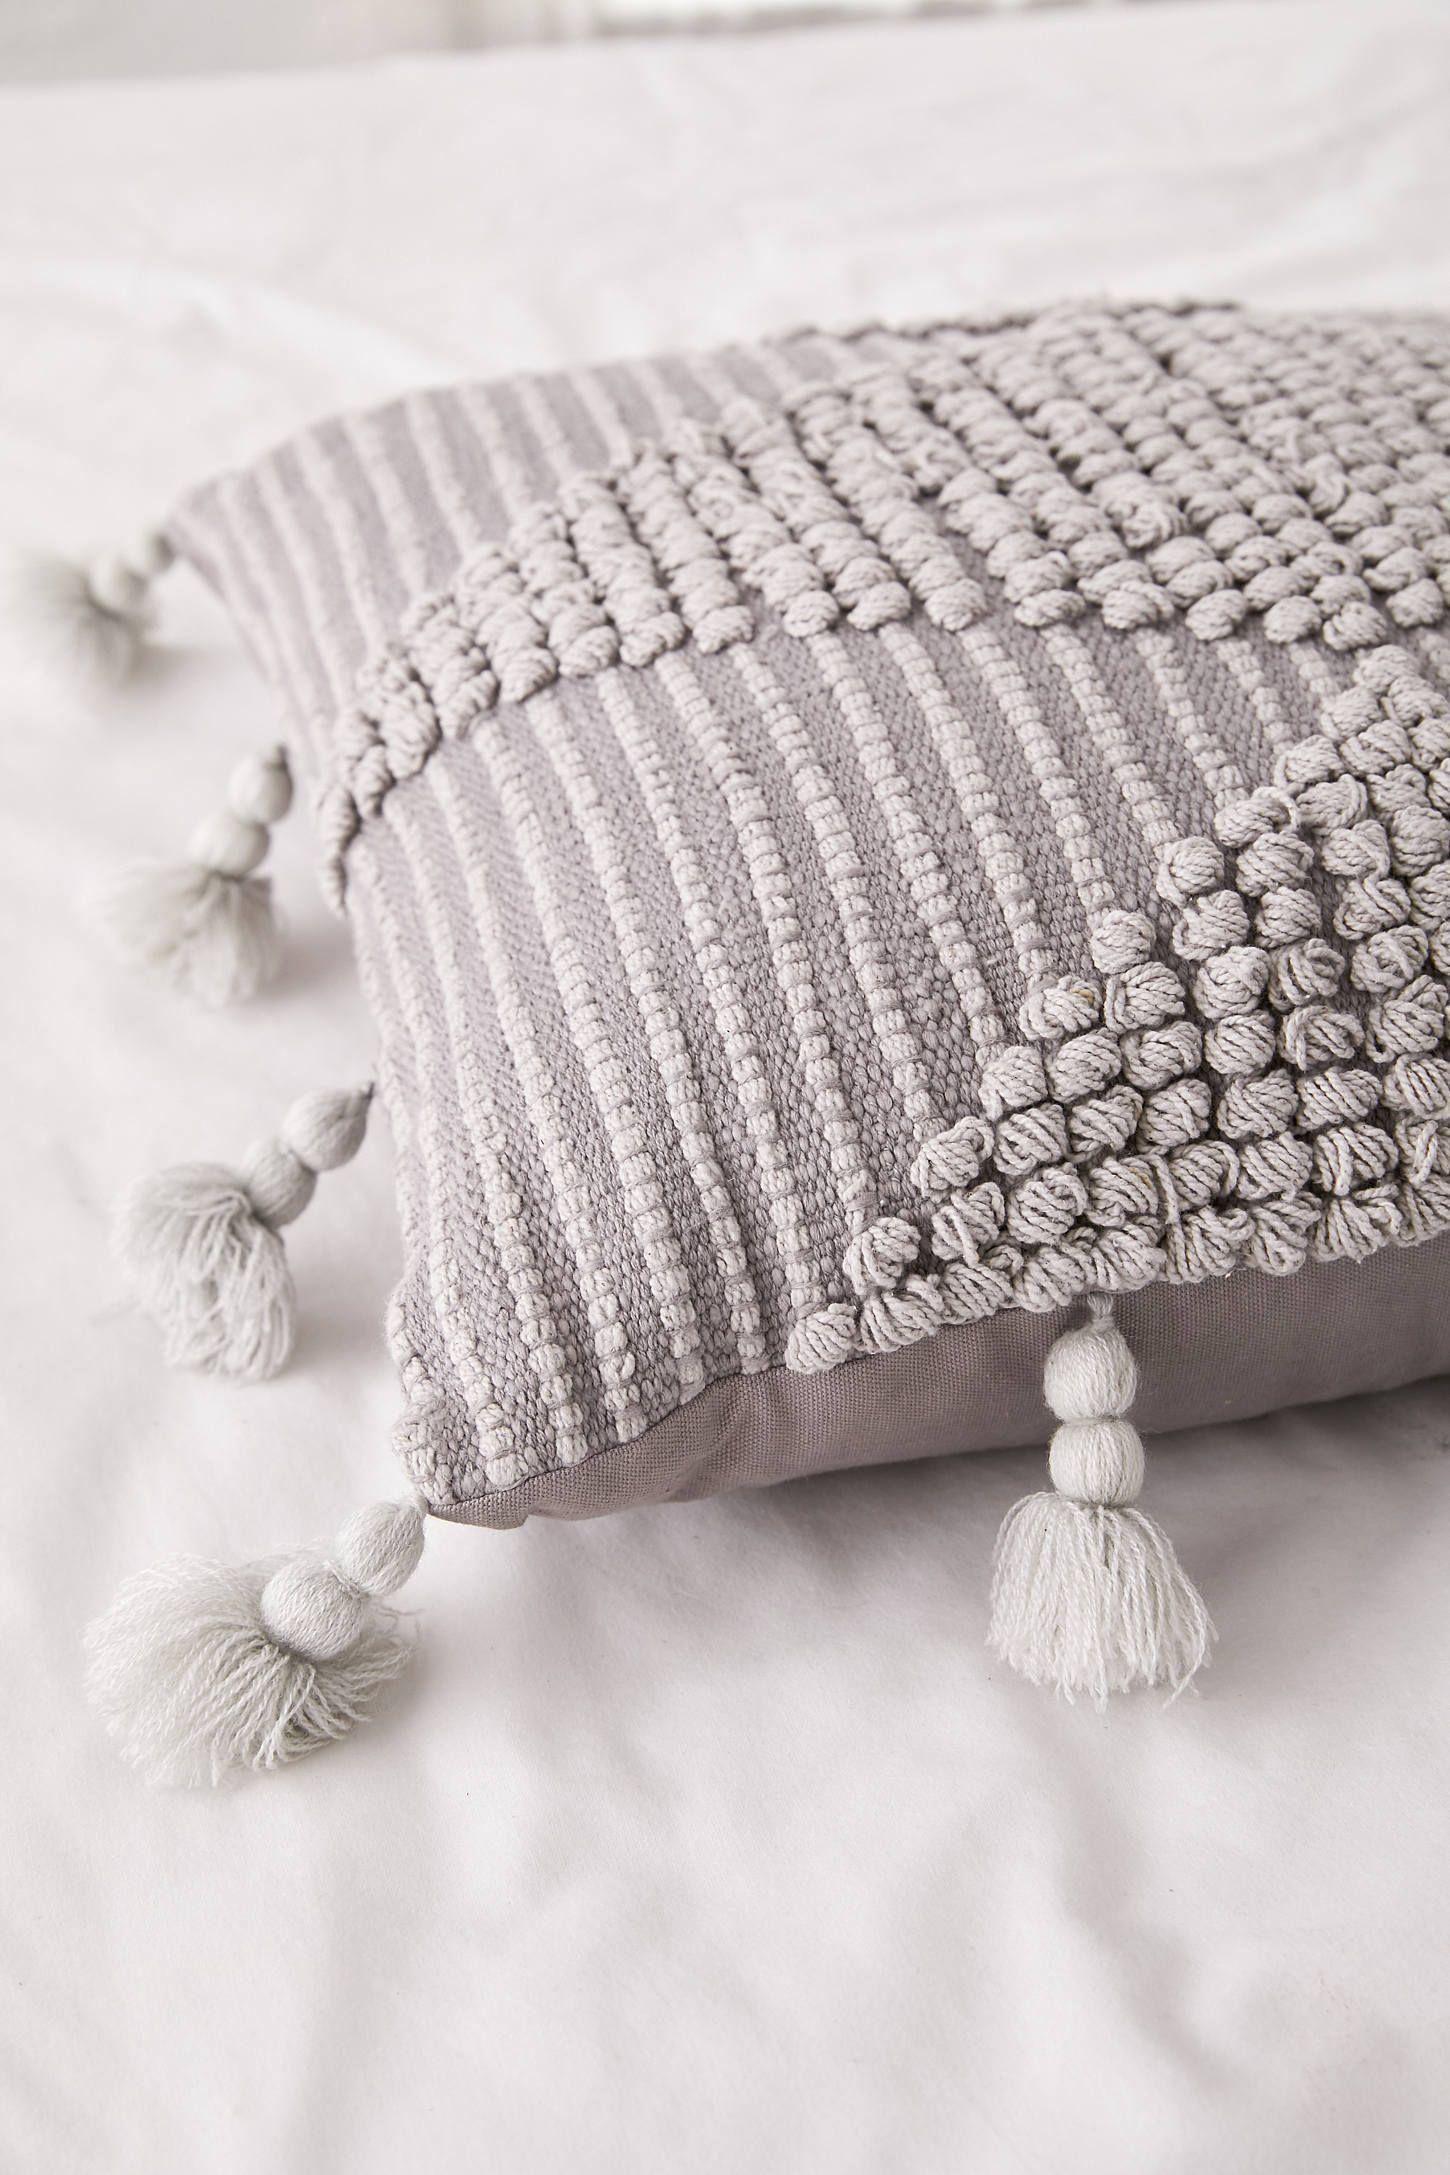 Geo textured throw pillow 1000 in 2020 throw pillows